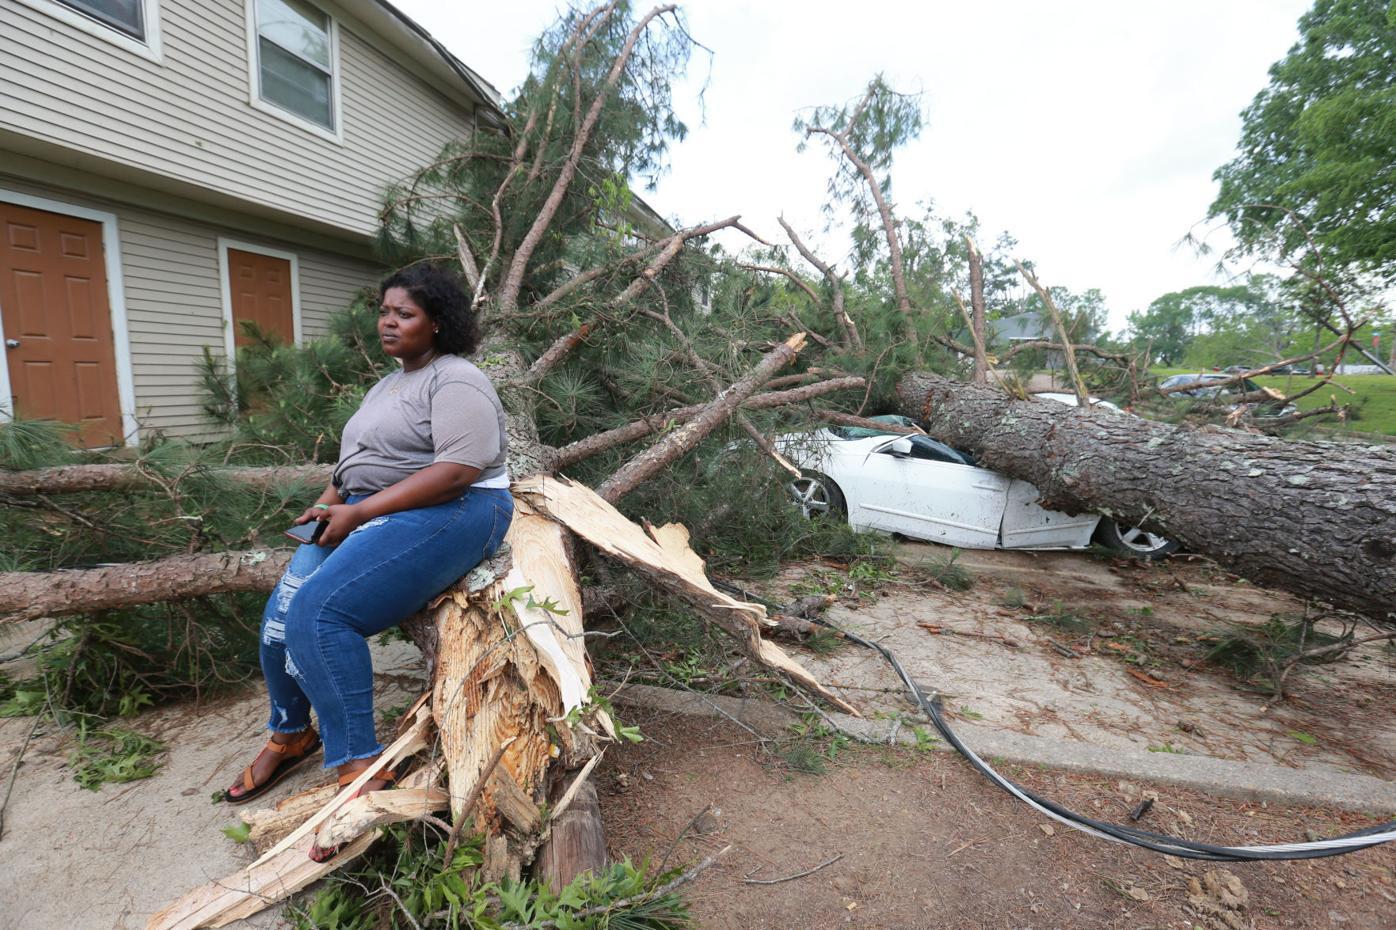 djr-2021-05-04-news-tornado-twp11